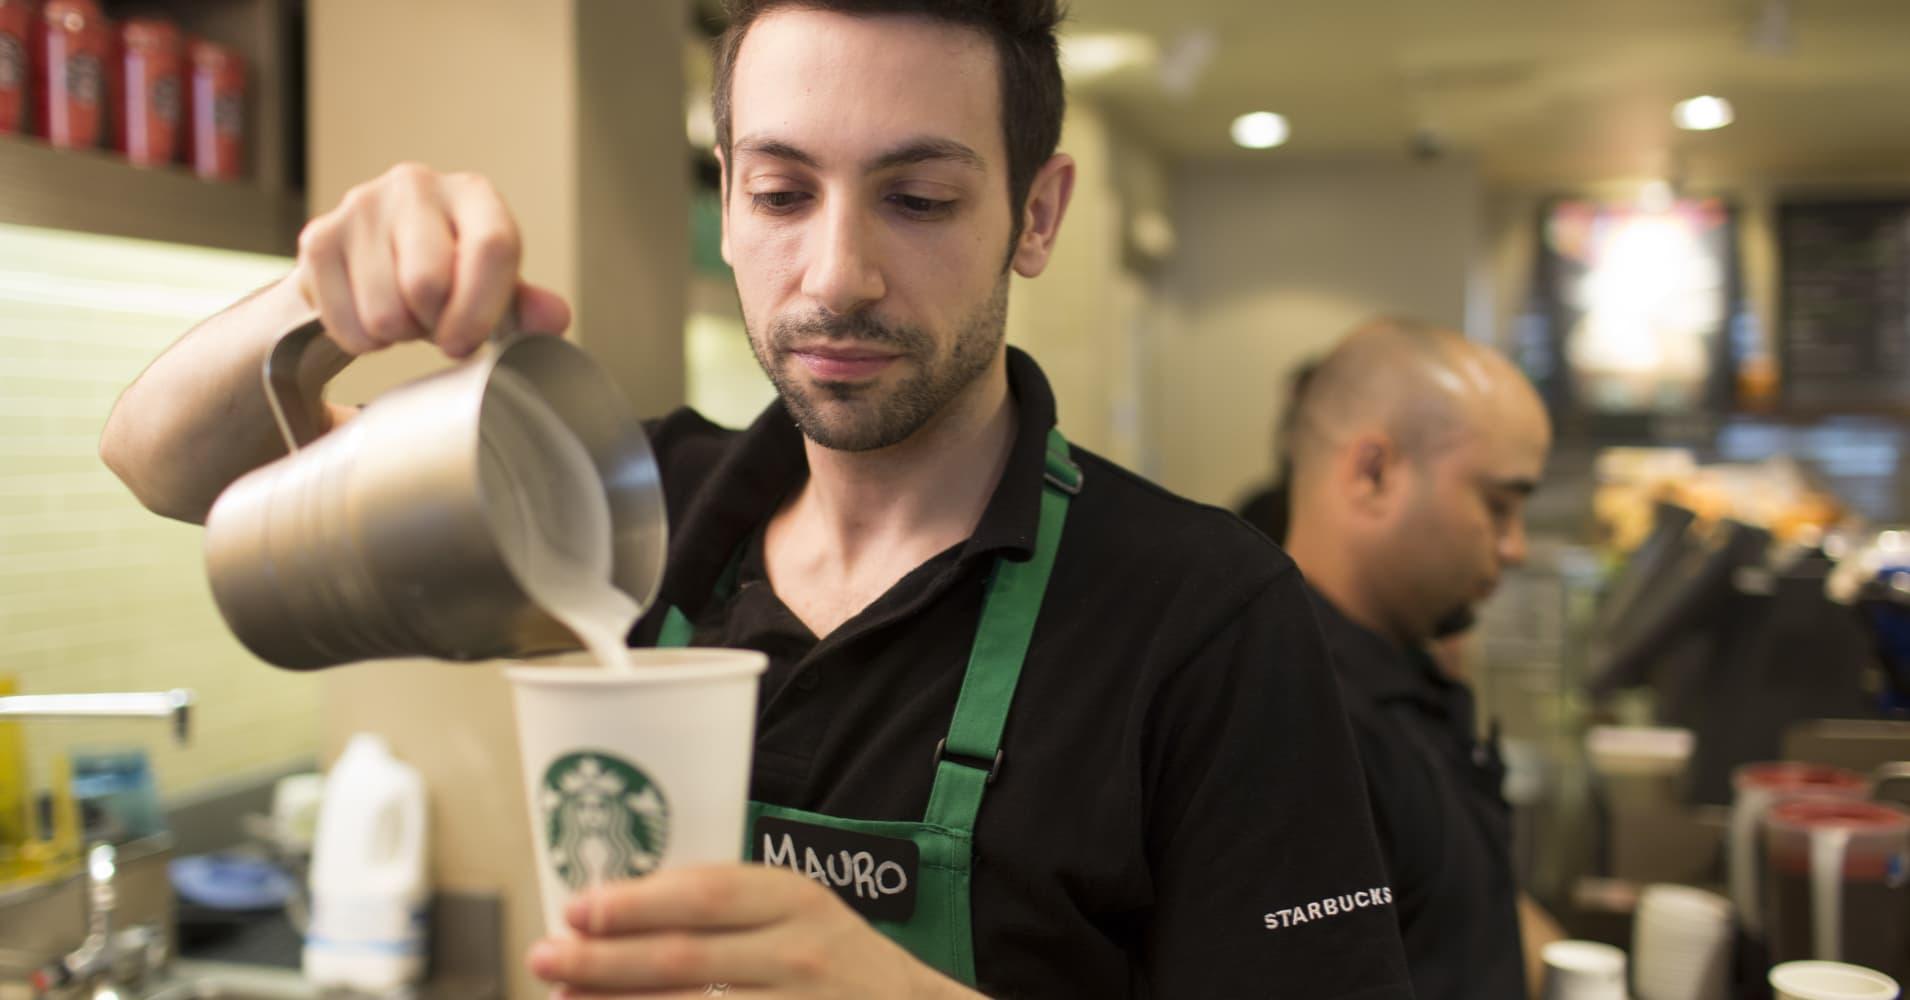 Pricier brews and premium food seen boosting Starbucks sales, KeyBanc says